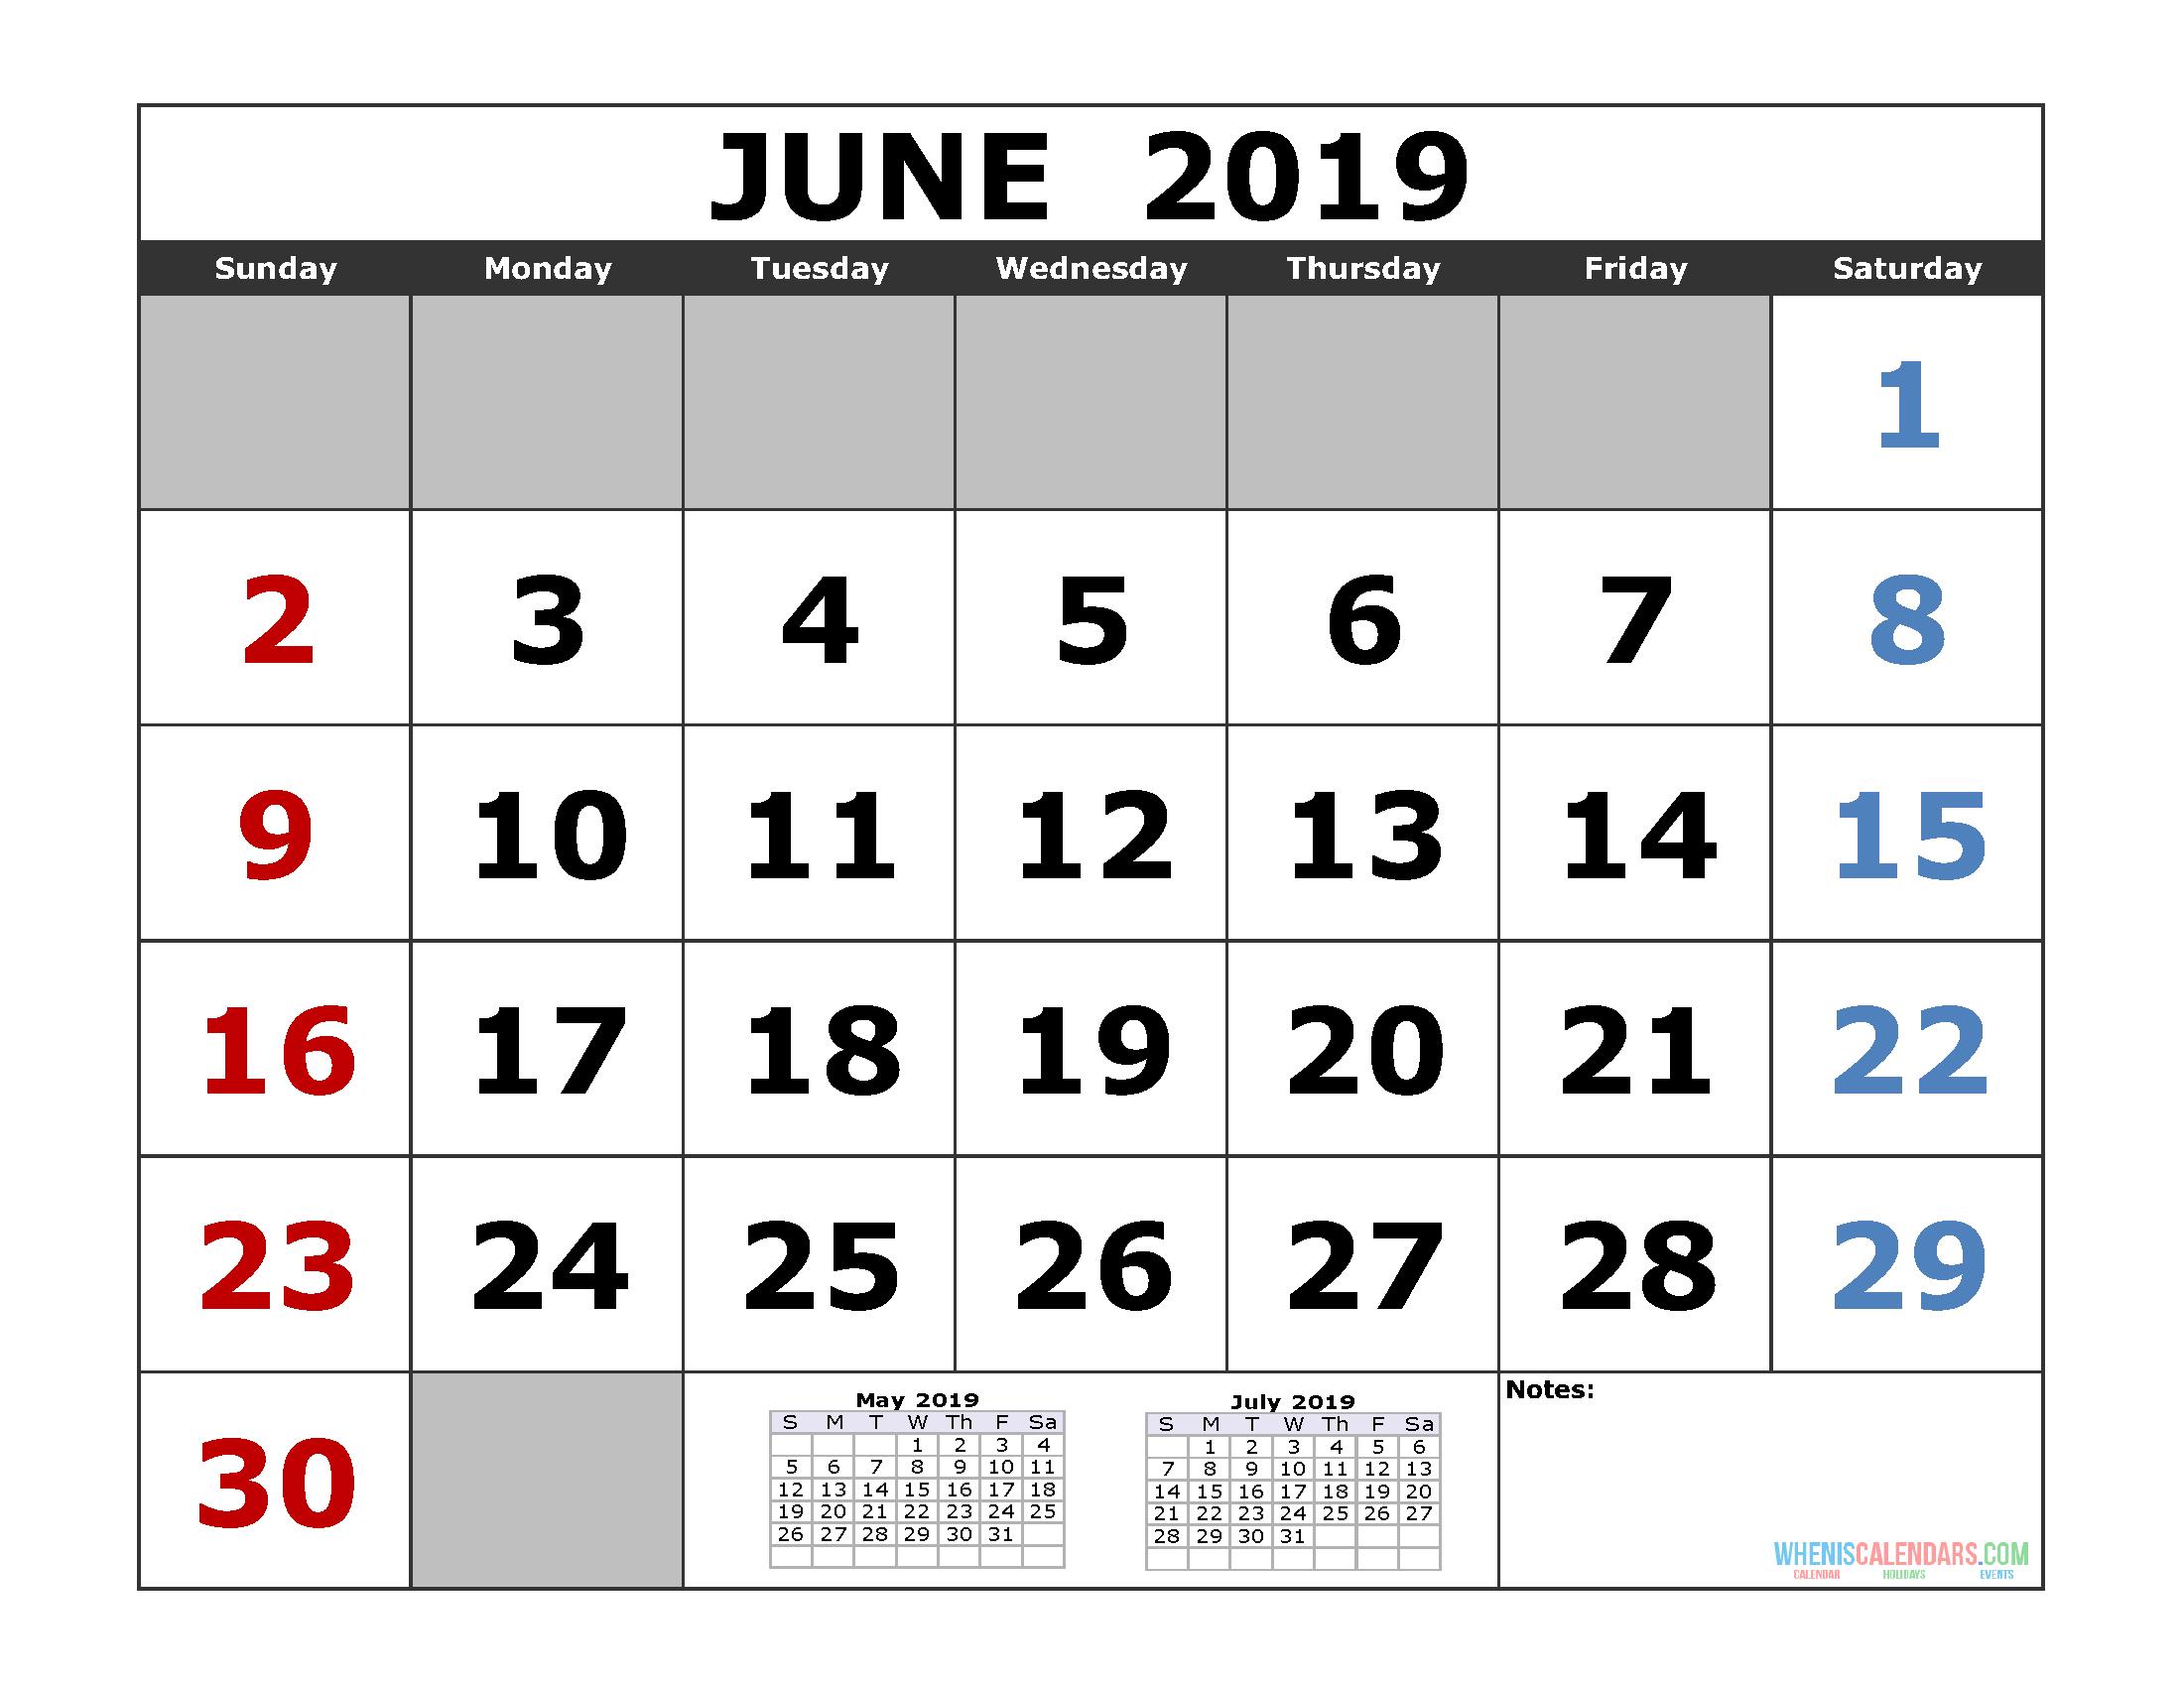 June 2019 Printable Calendar Template (3 Month Calendar)   Free June 8 2019 Calendar